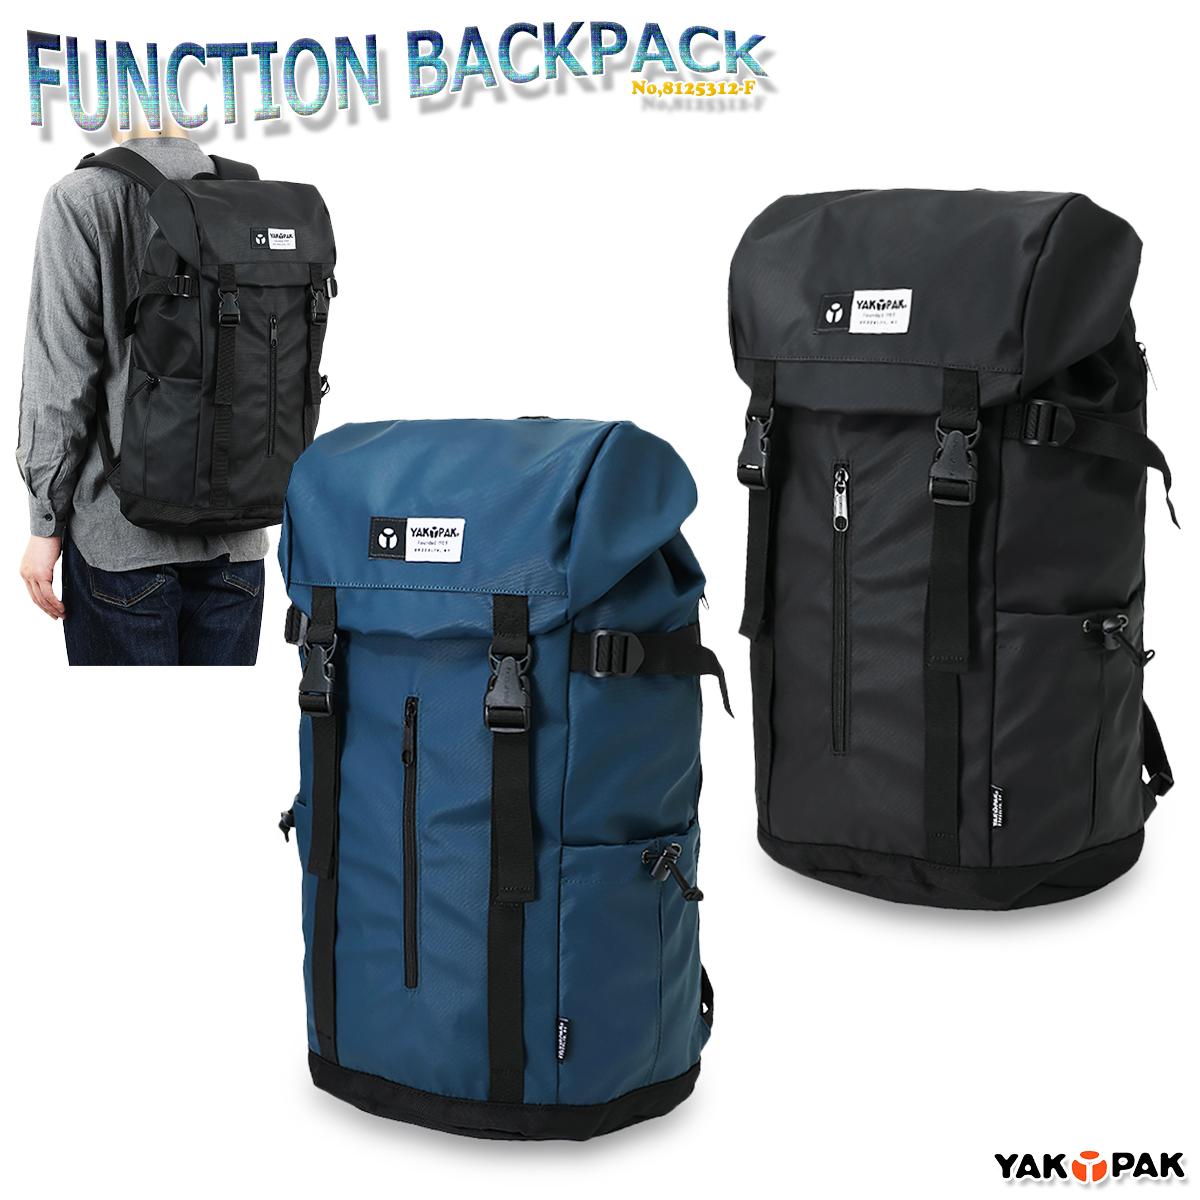 bd63f9c19b40 Manhattan Portage bag Wildcat Big Apple Backpack (MD)1209-WDC-MT Hiking Bag  リュックサック リュック バッグ バッグパック hiking ハイキング 機能性 ...